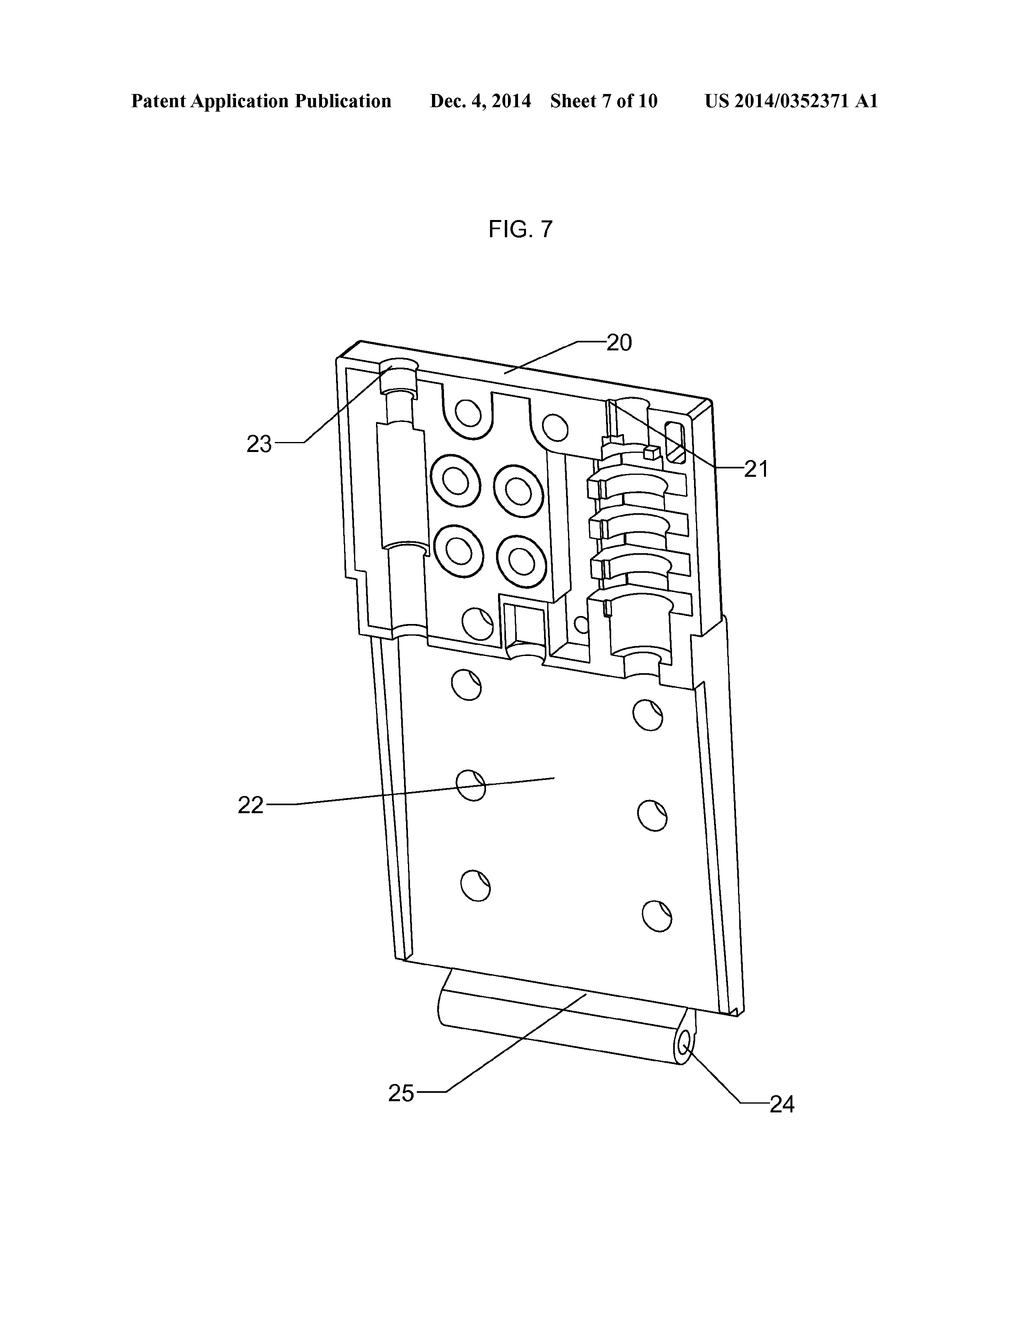 Combo Lock Box Diagram Automotive Wiring Combination Key With Anti Pick Mechanism Rh Patentsencyclopedia Com Home Security Push Button Locks